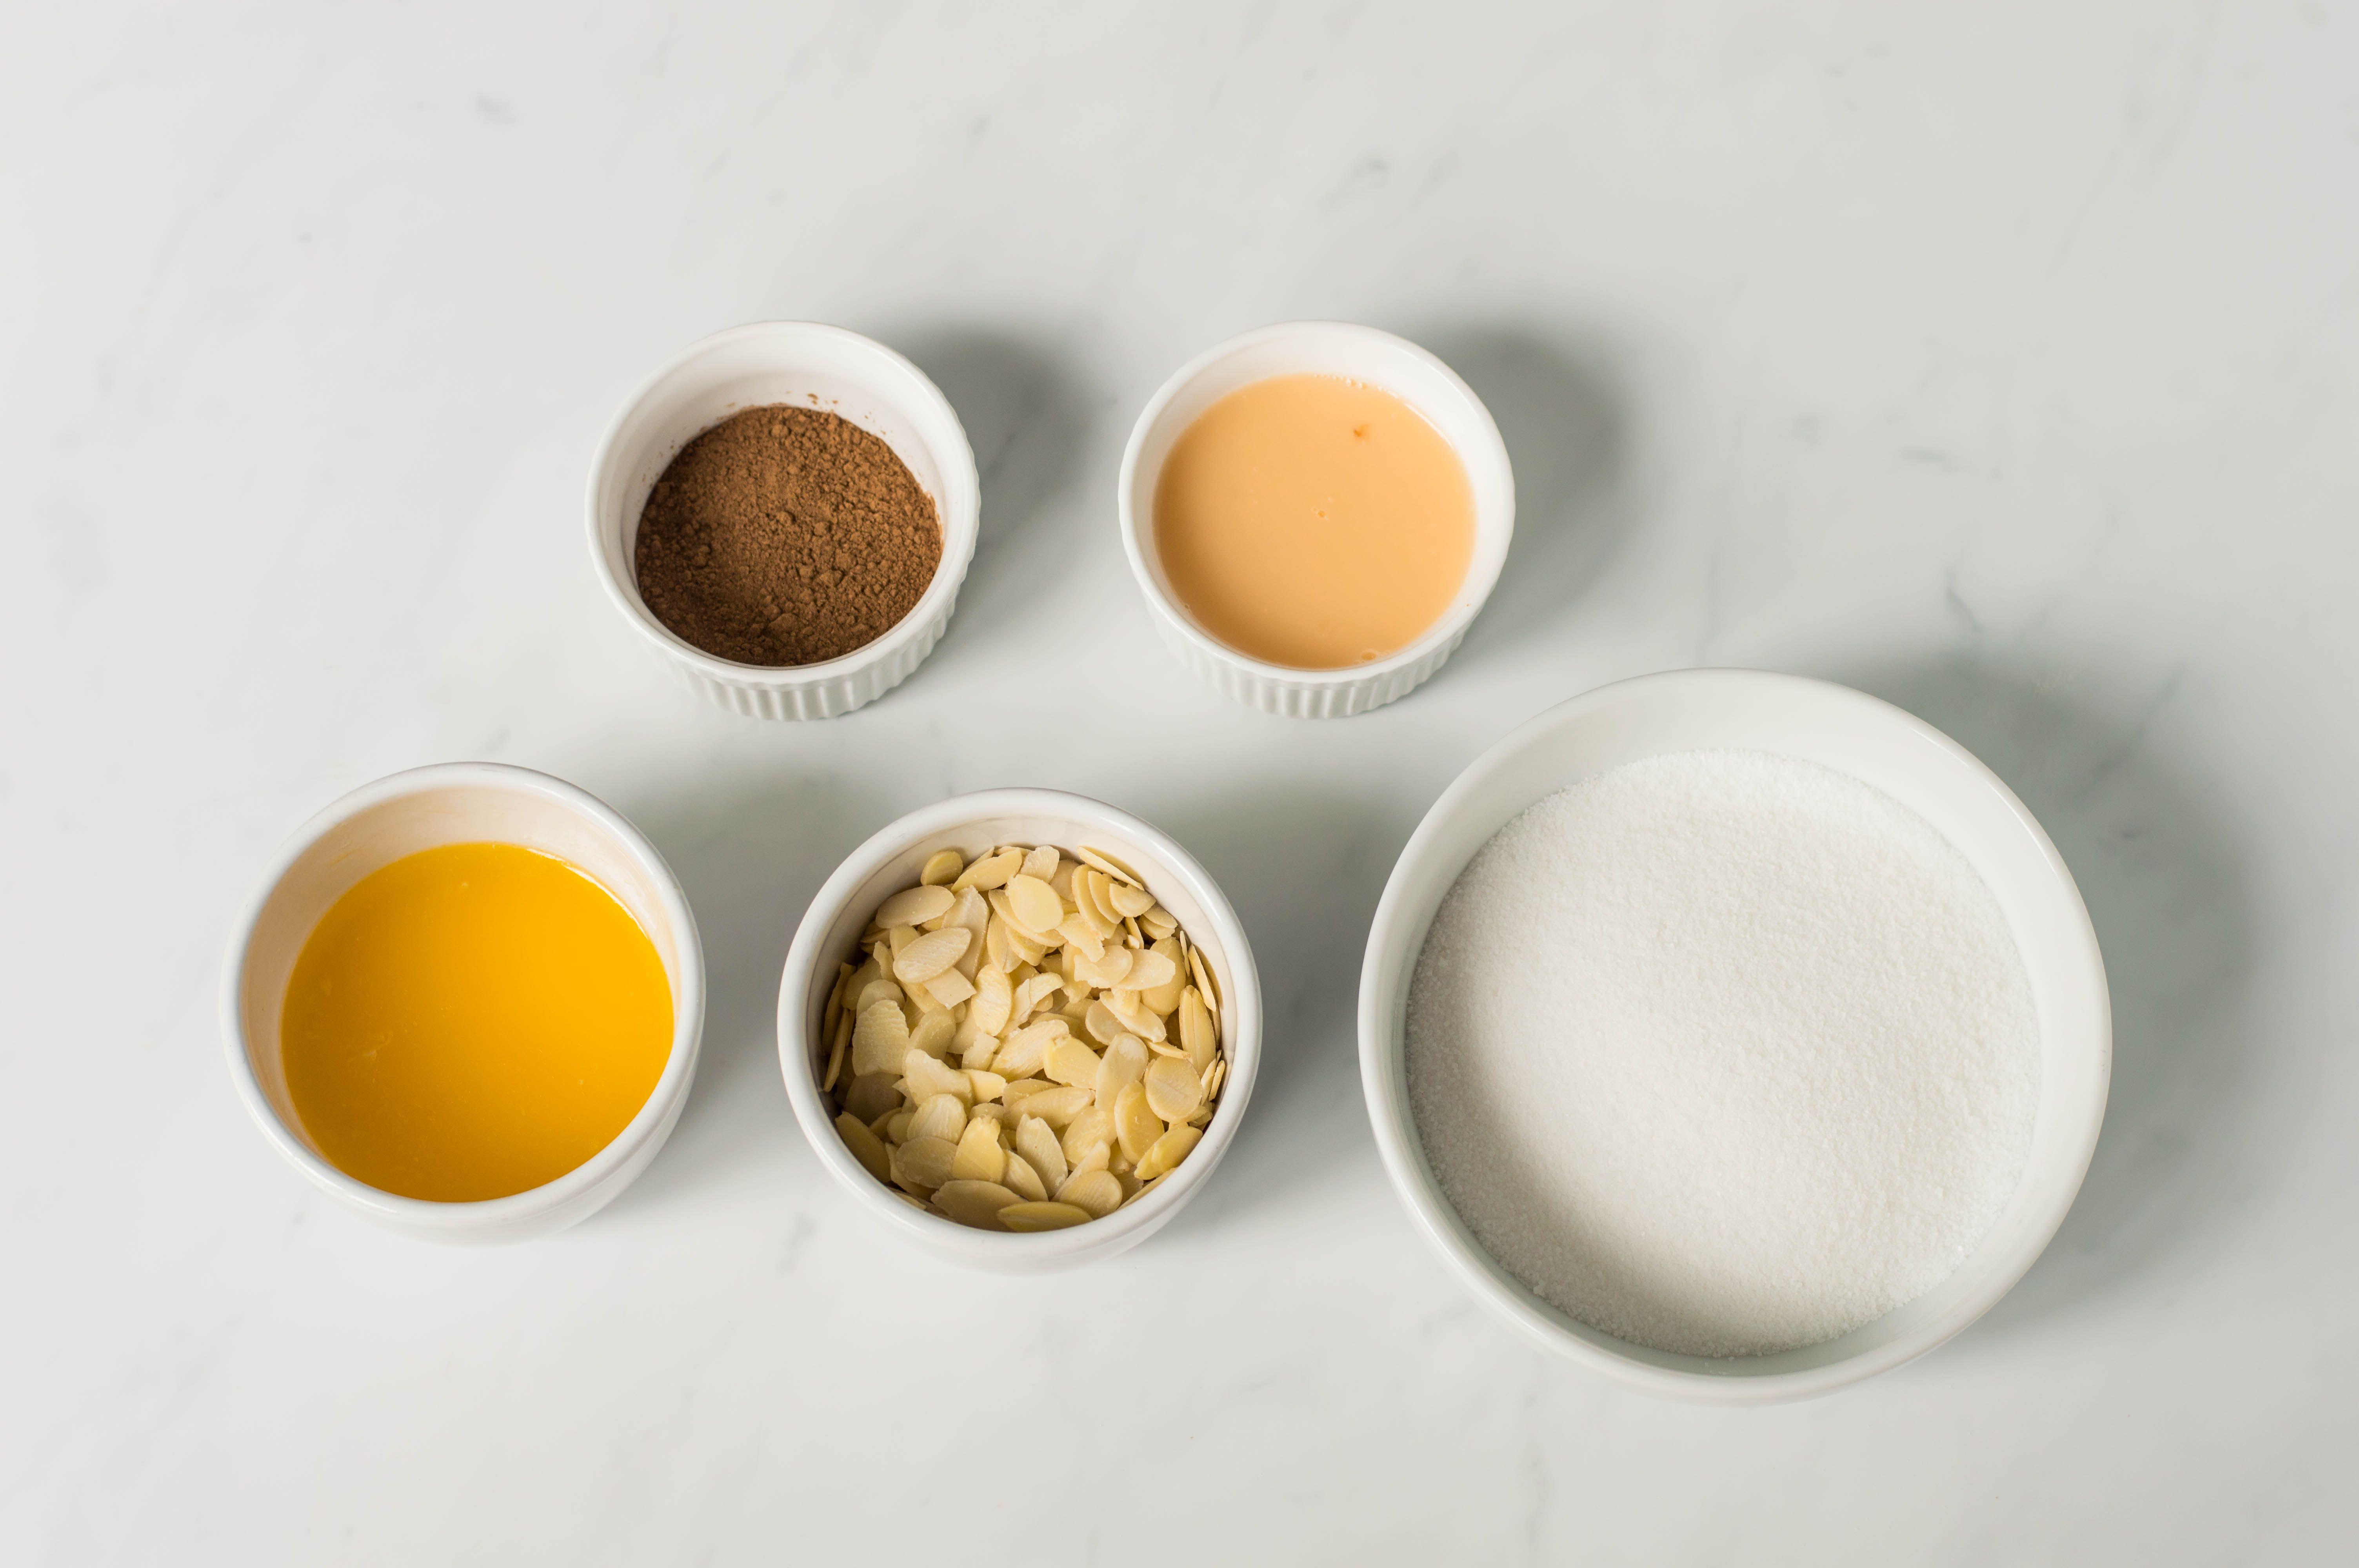 Swedish cinnamon rolls recipe ingredients for the filling